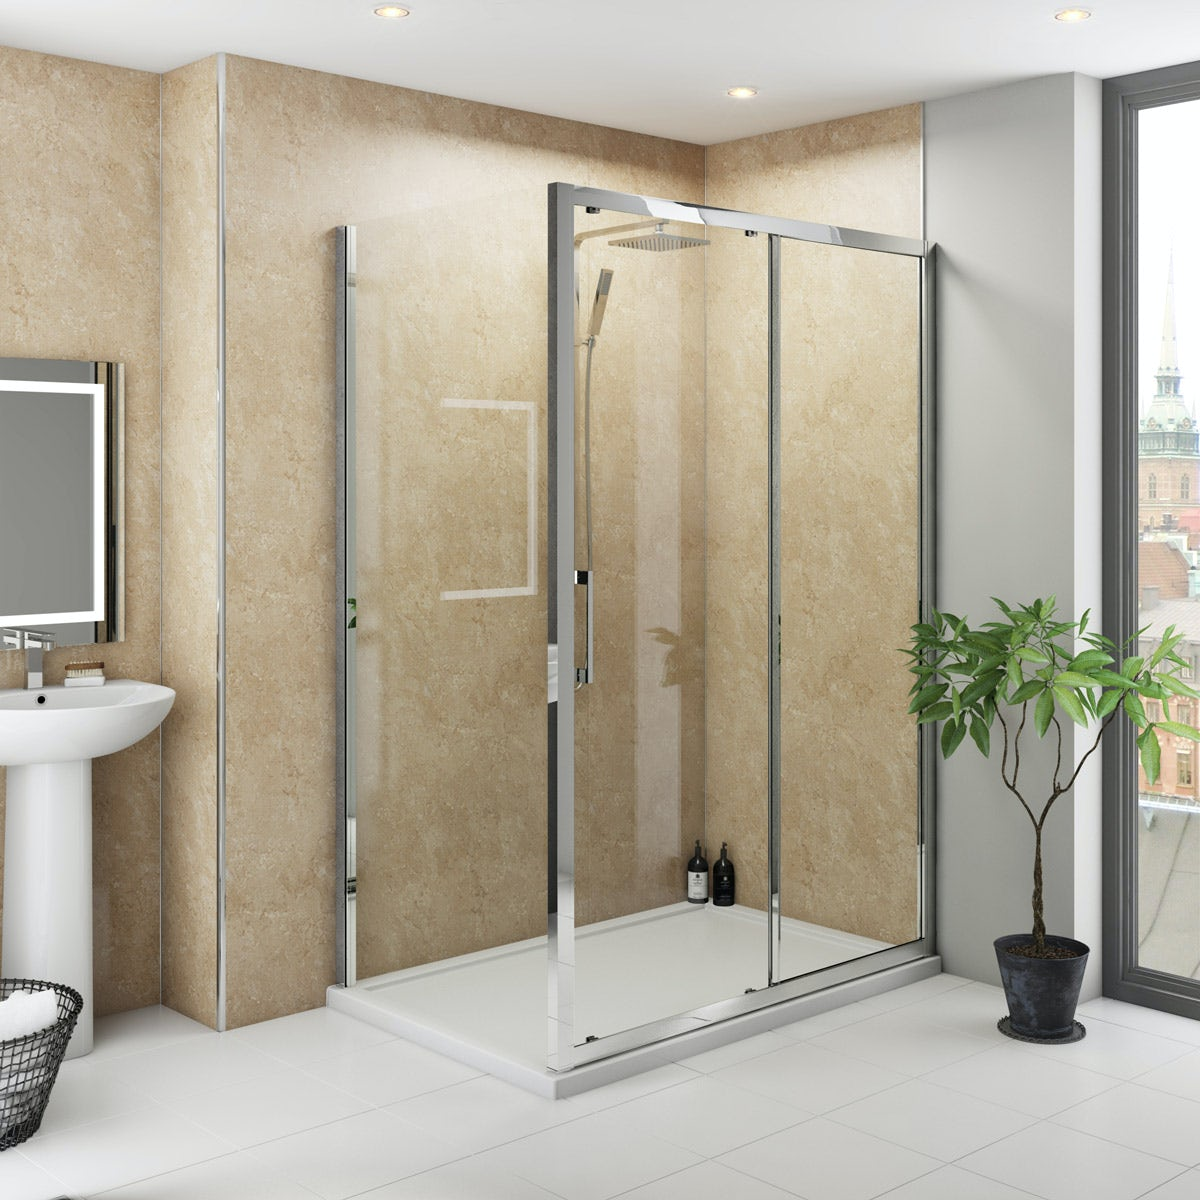 Multipanel Classic Travertine Hydrolock shower wall panel